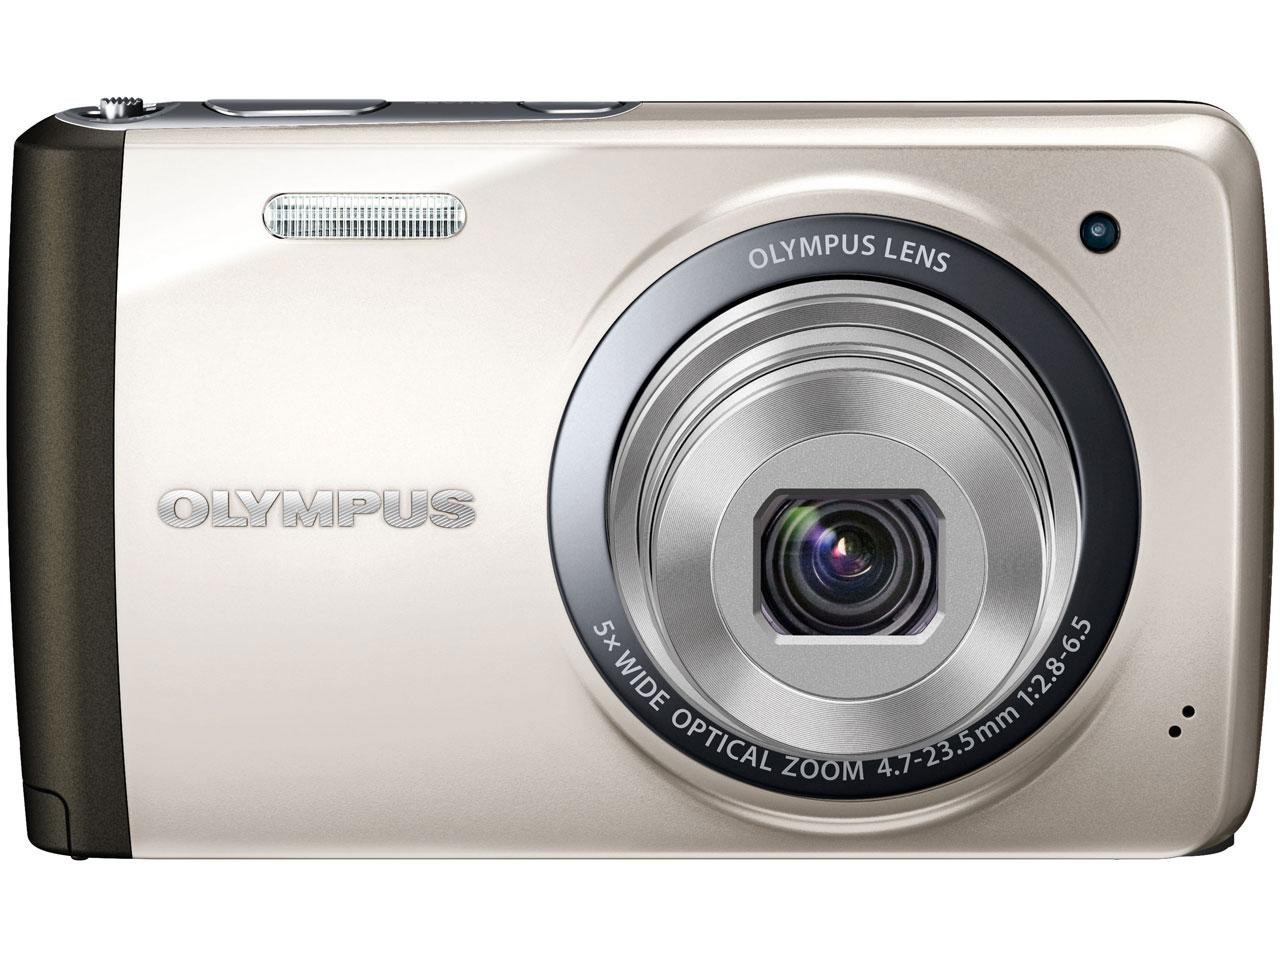 OLYMPUS STYLUS VH-410 の製品画像